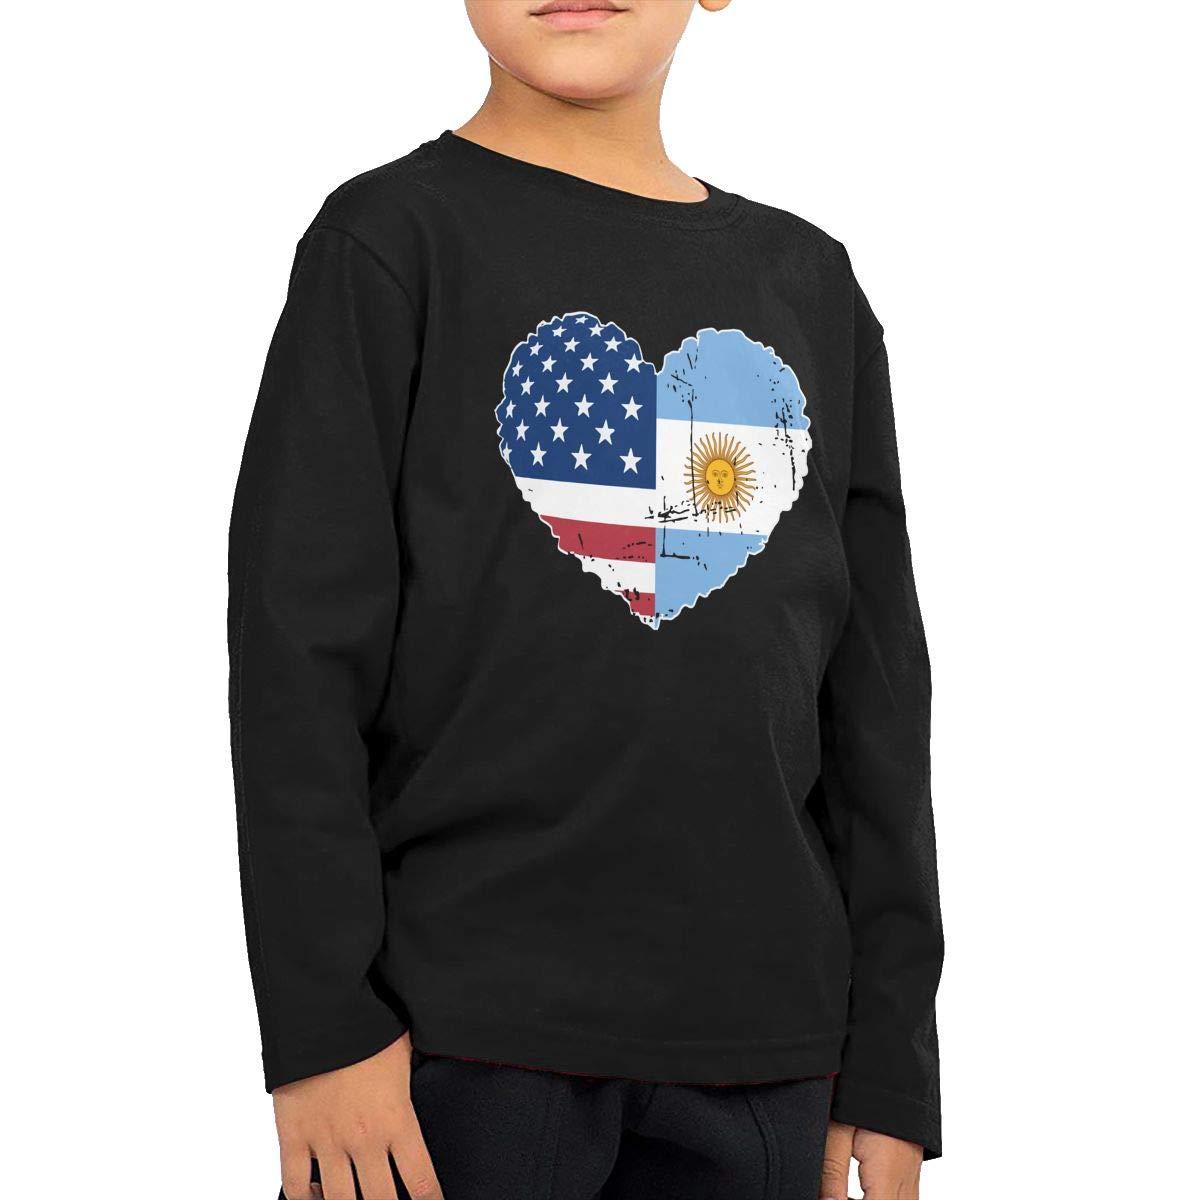 CERTONGCXTS Baby Boys Kids Argentina USA Flag Heart ComfortSoft Long Sleeve Tee